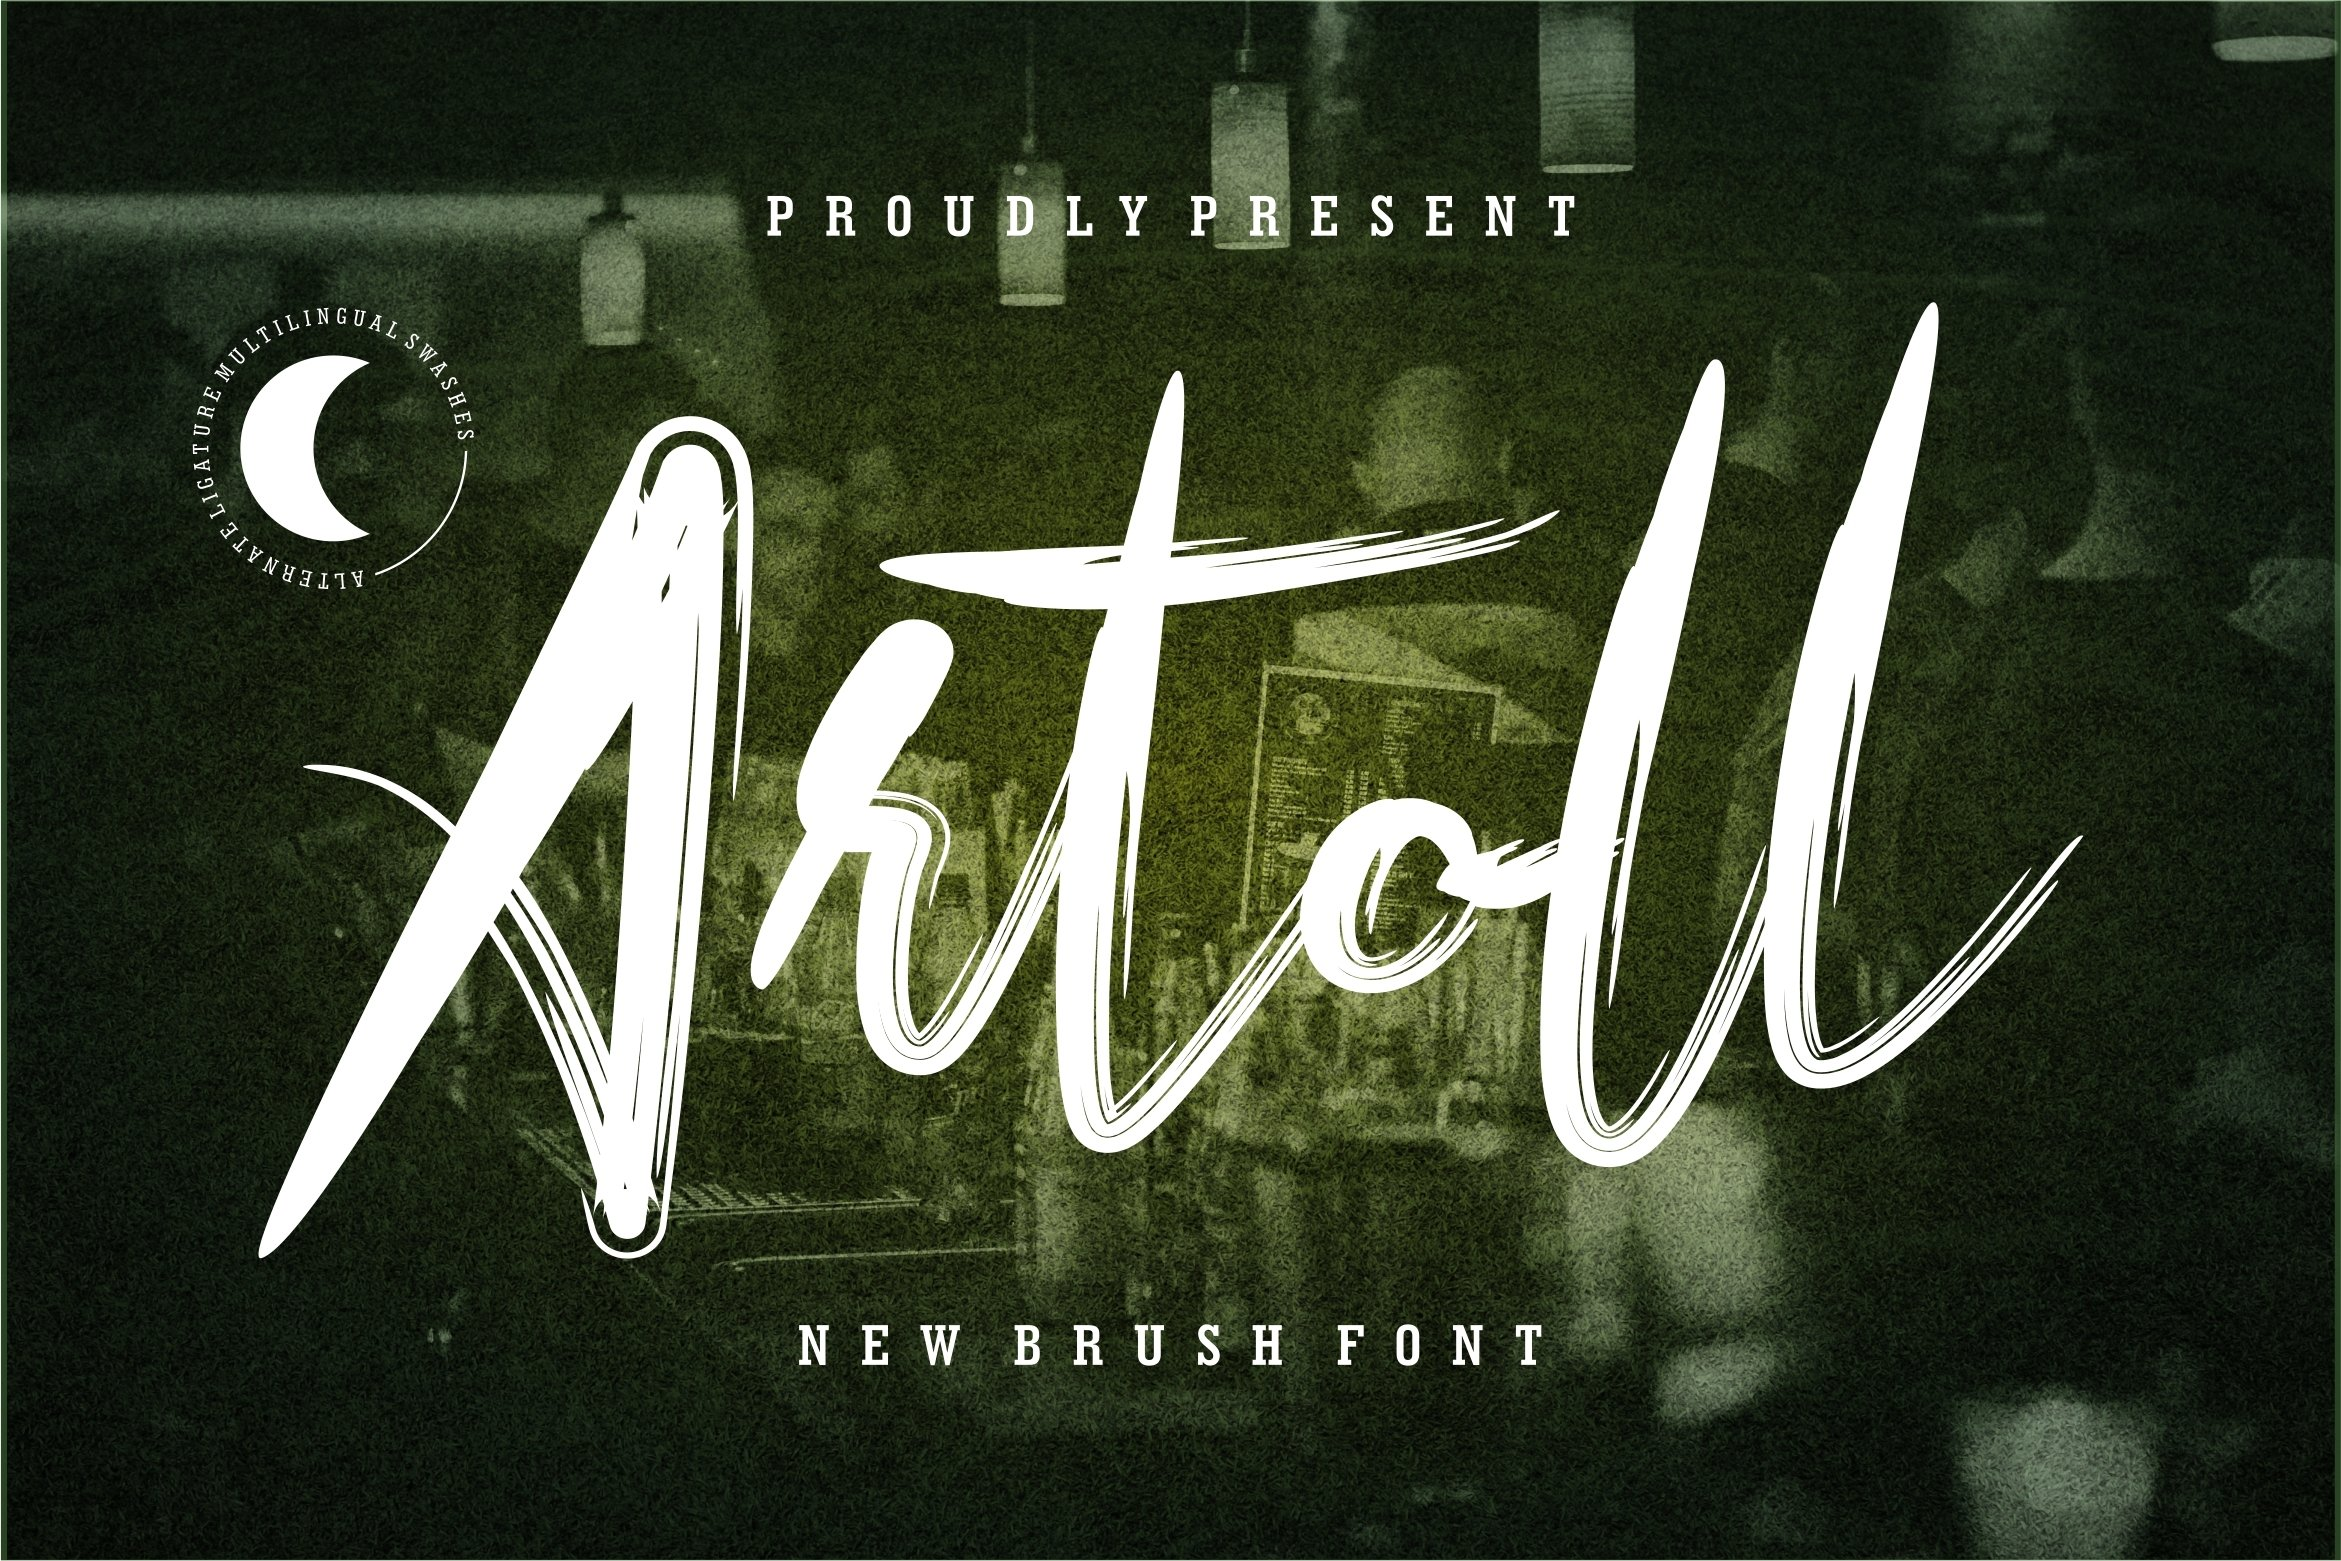 Artoll - New Brush Font example image 1